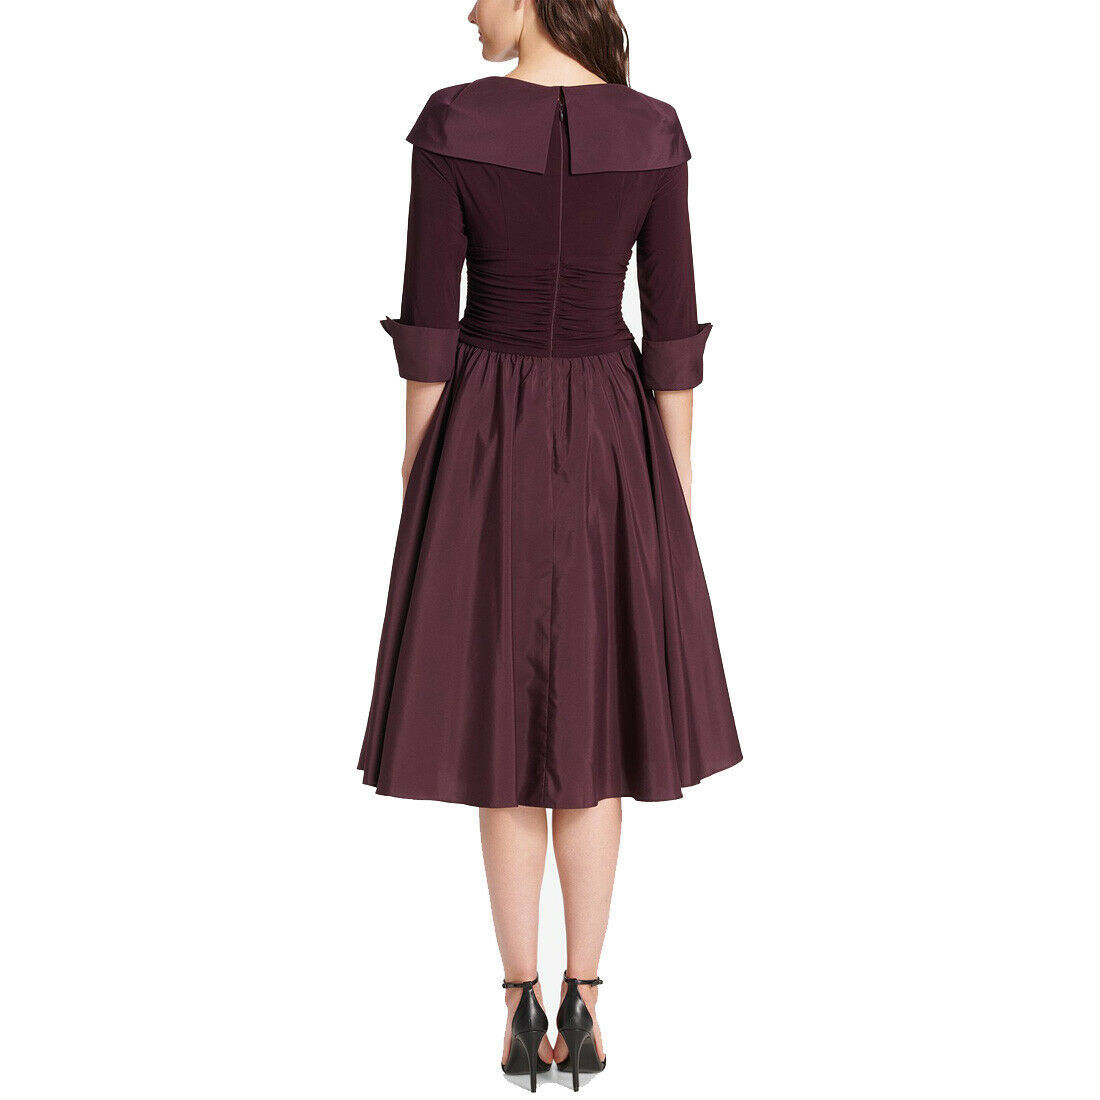 Jessica Howard Portrait-Collar A-Line Dress, Eggplant, 14W